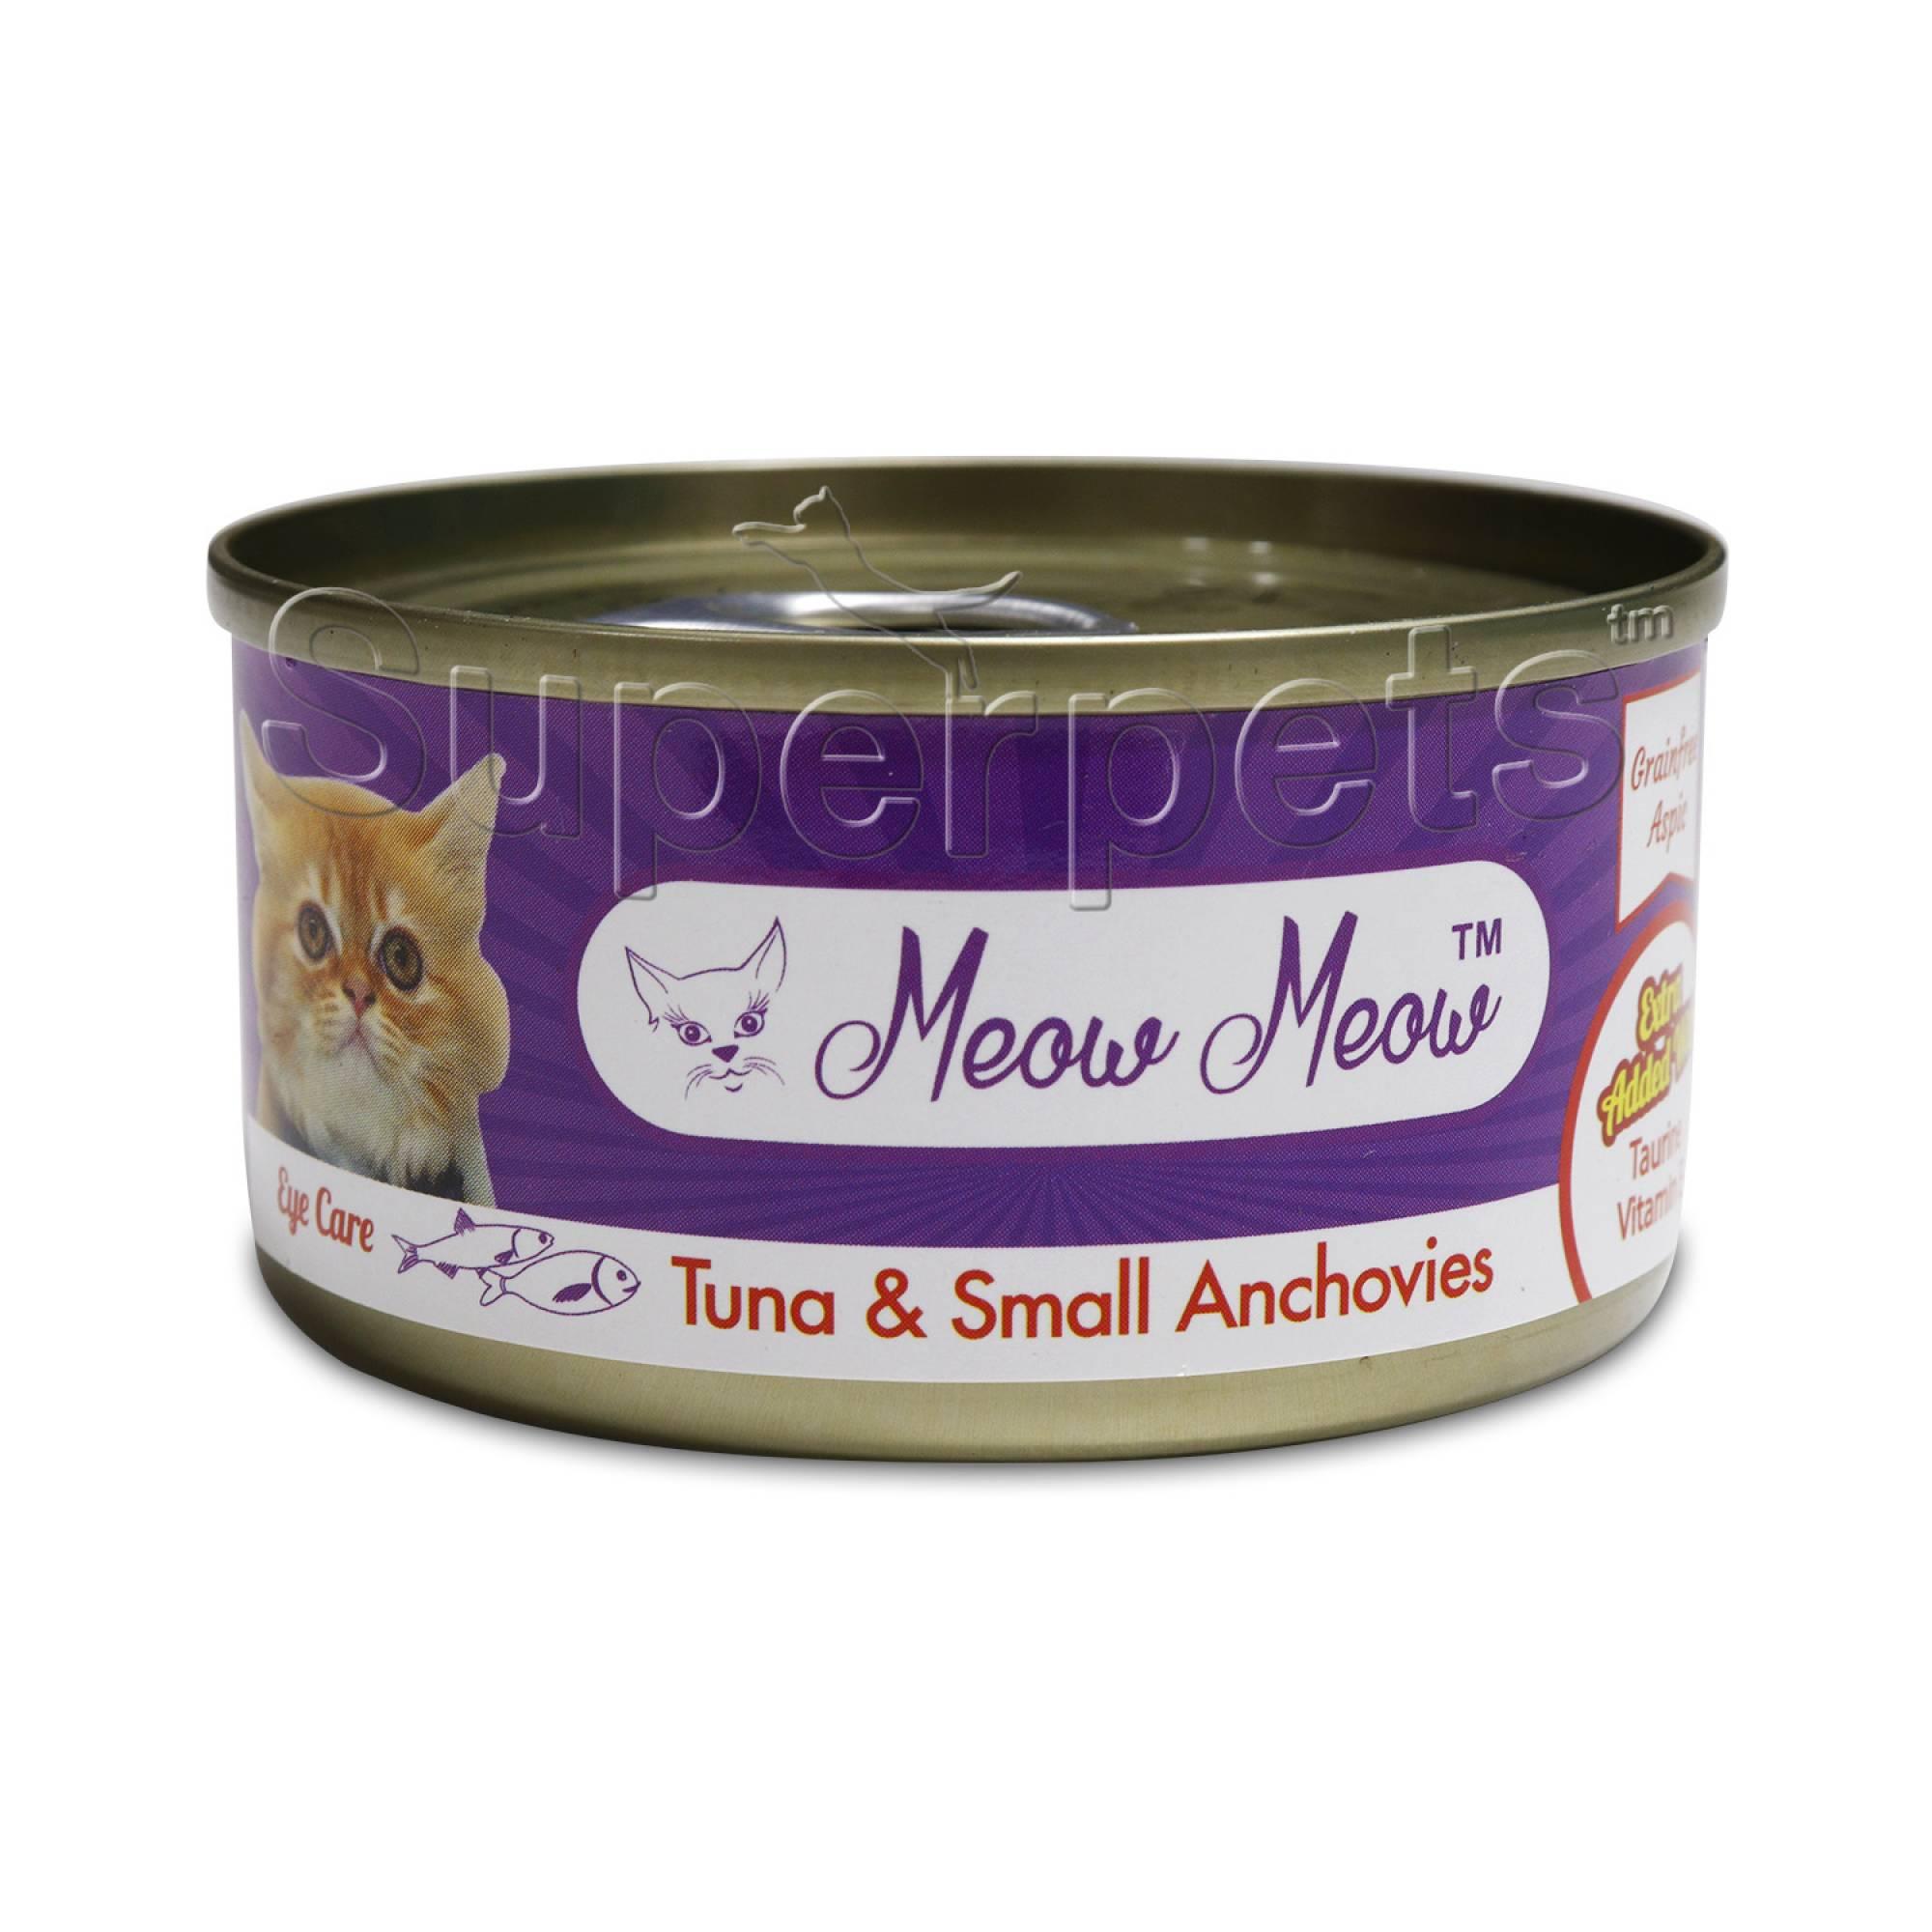 Meow Meow - Tuna & Small Anchovies - Grain Free 80g x 24pcs (1 carton)